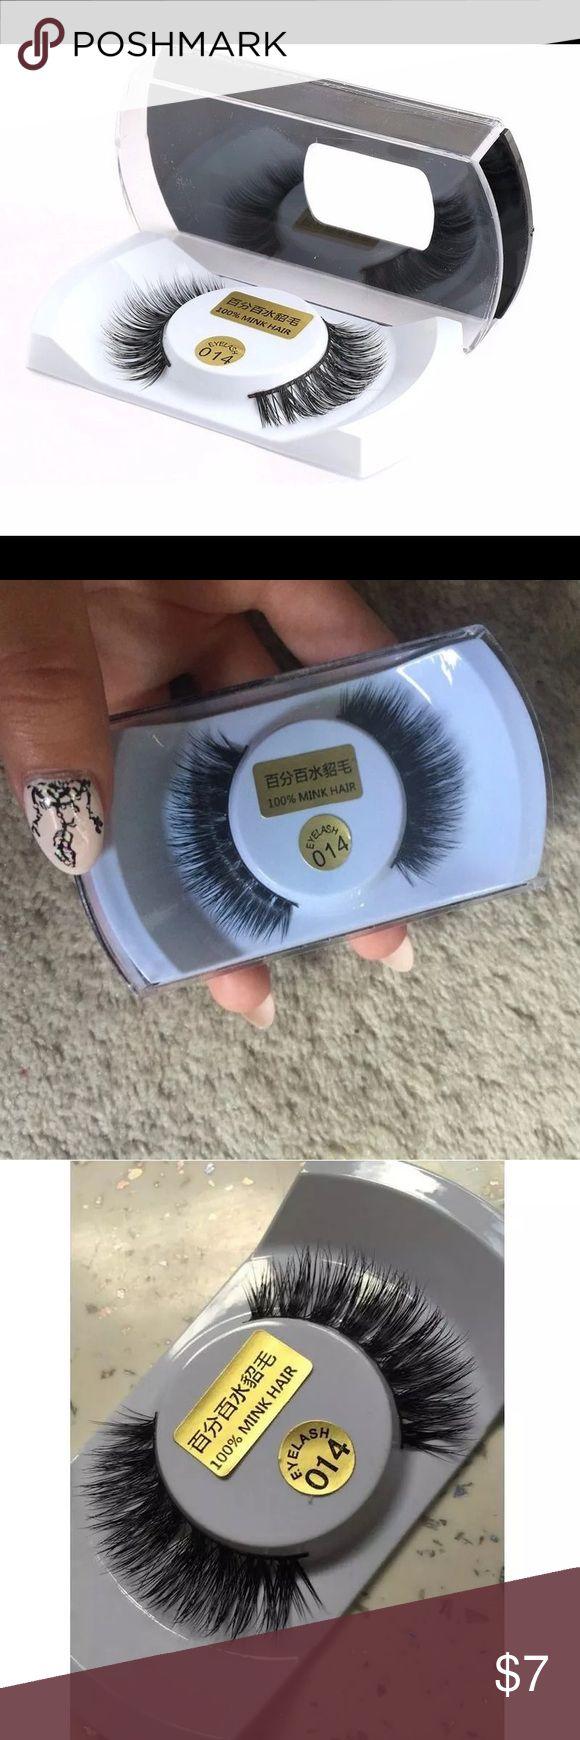 🌿🍃1 pair 100% real mink natural black tick New in box of eyelash 100% real mink natural black tick hair ! Makeup False Eyelashes